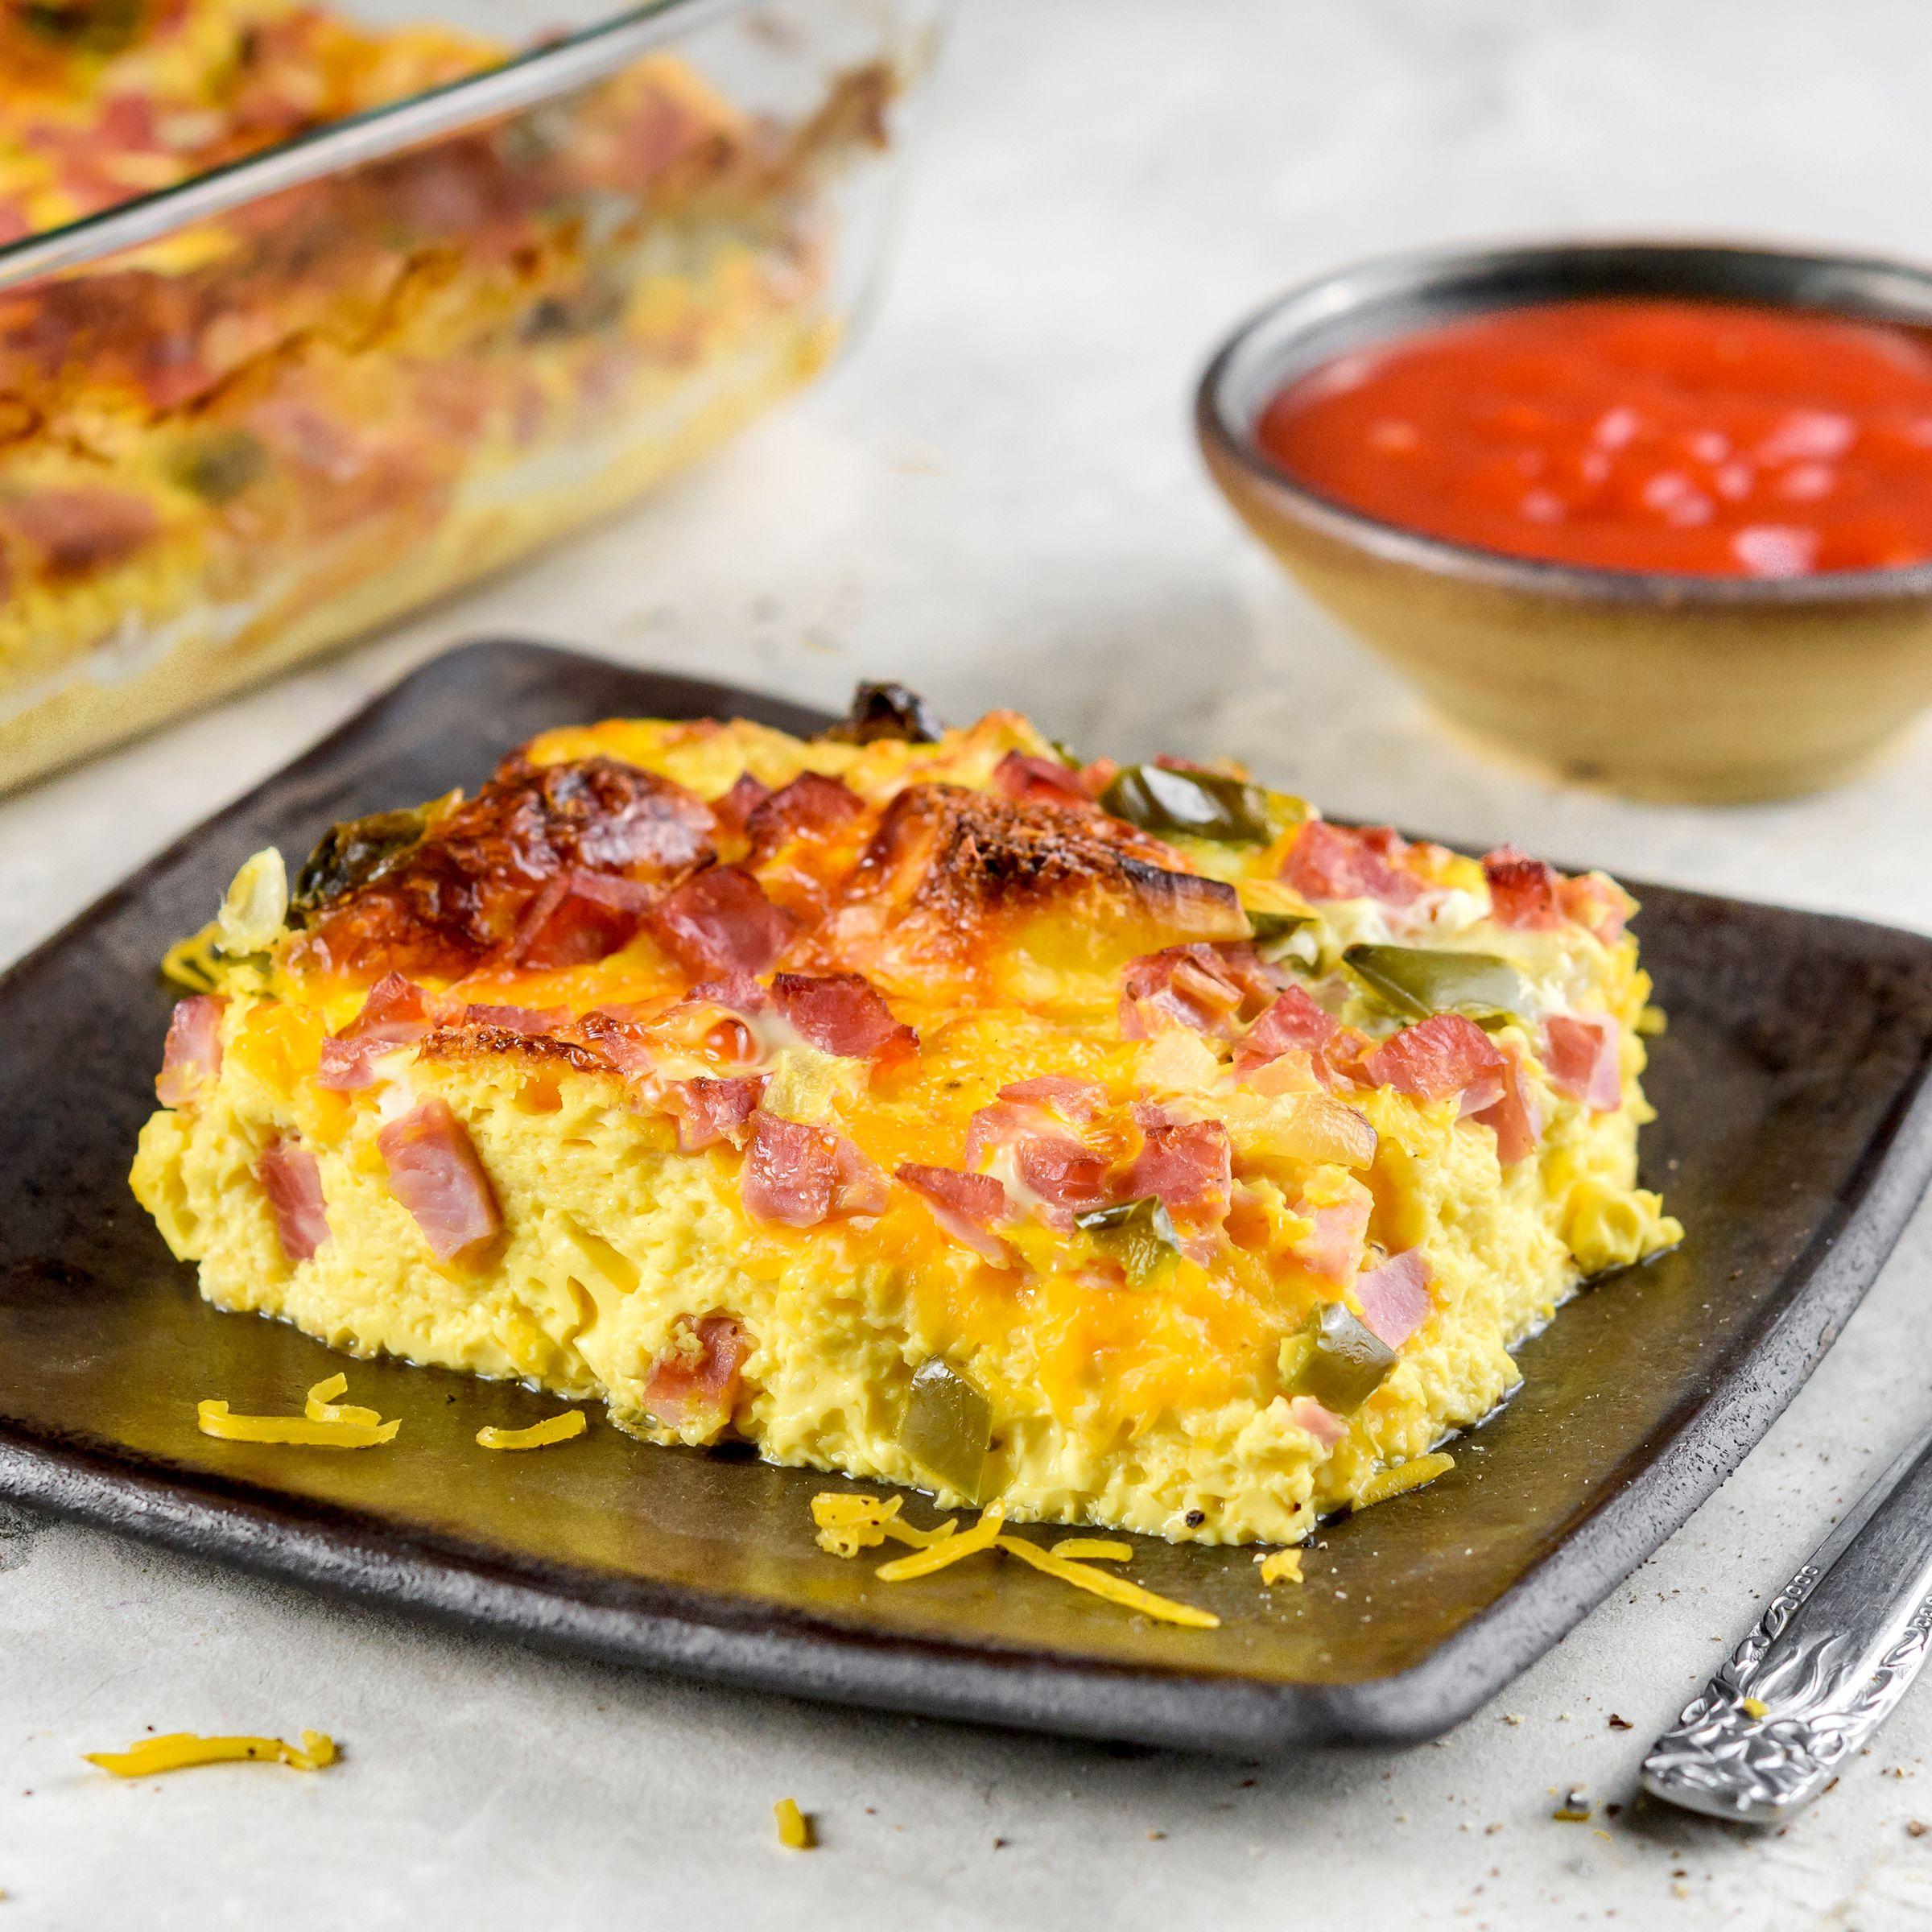 Western Ham And Egg Casserole Recipe